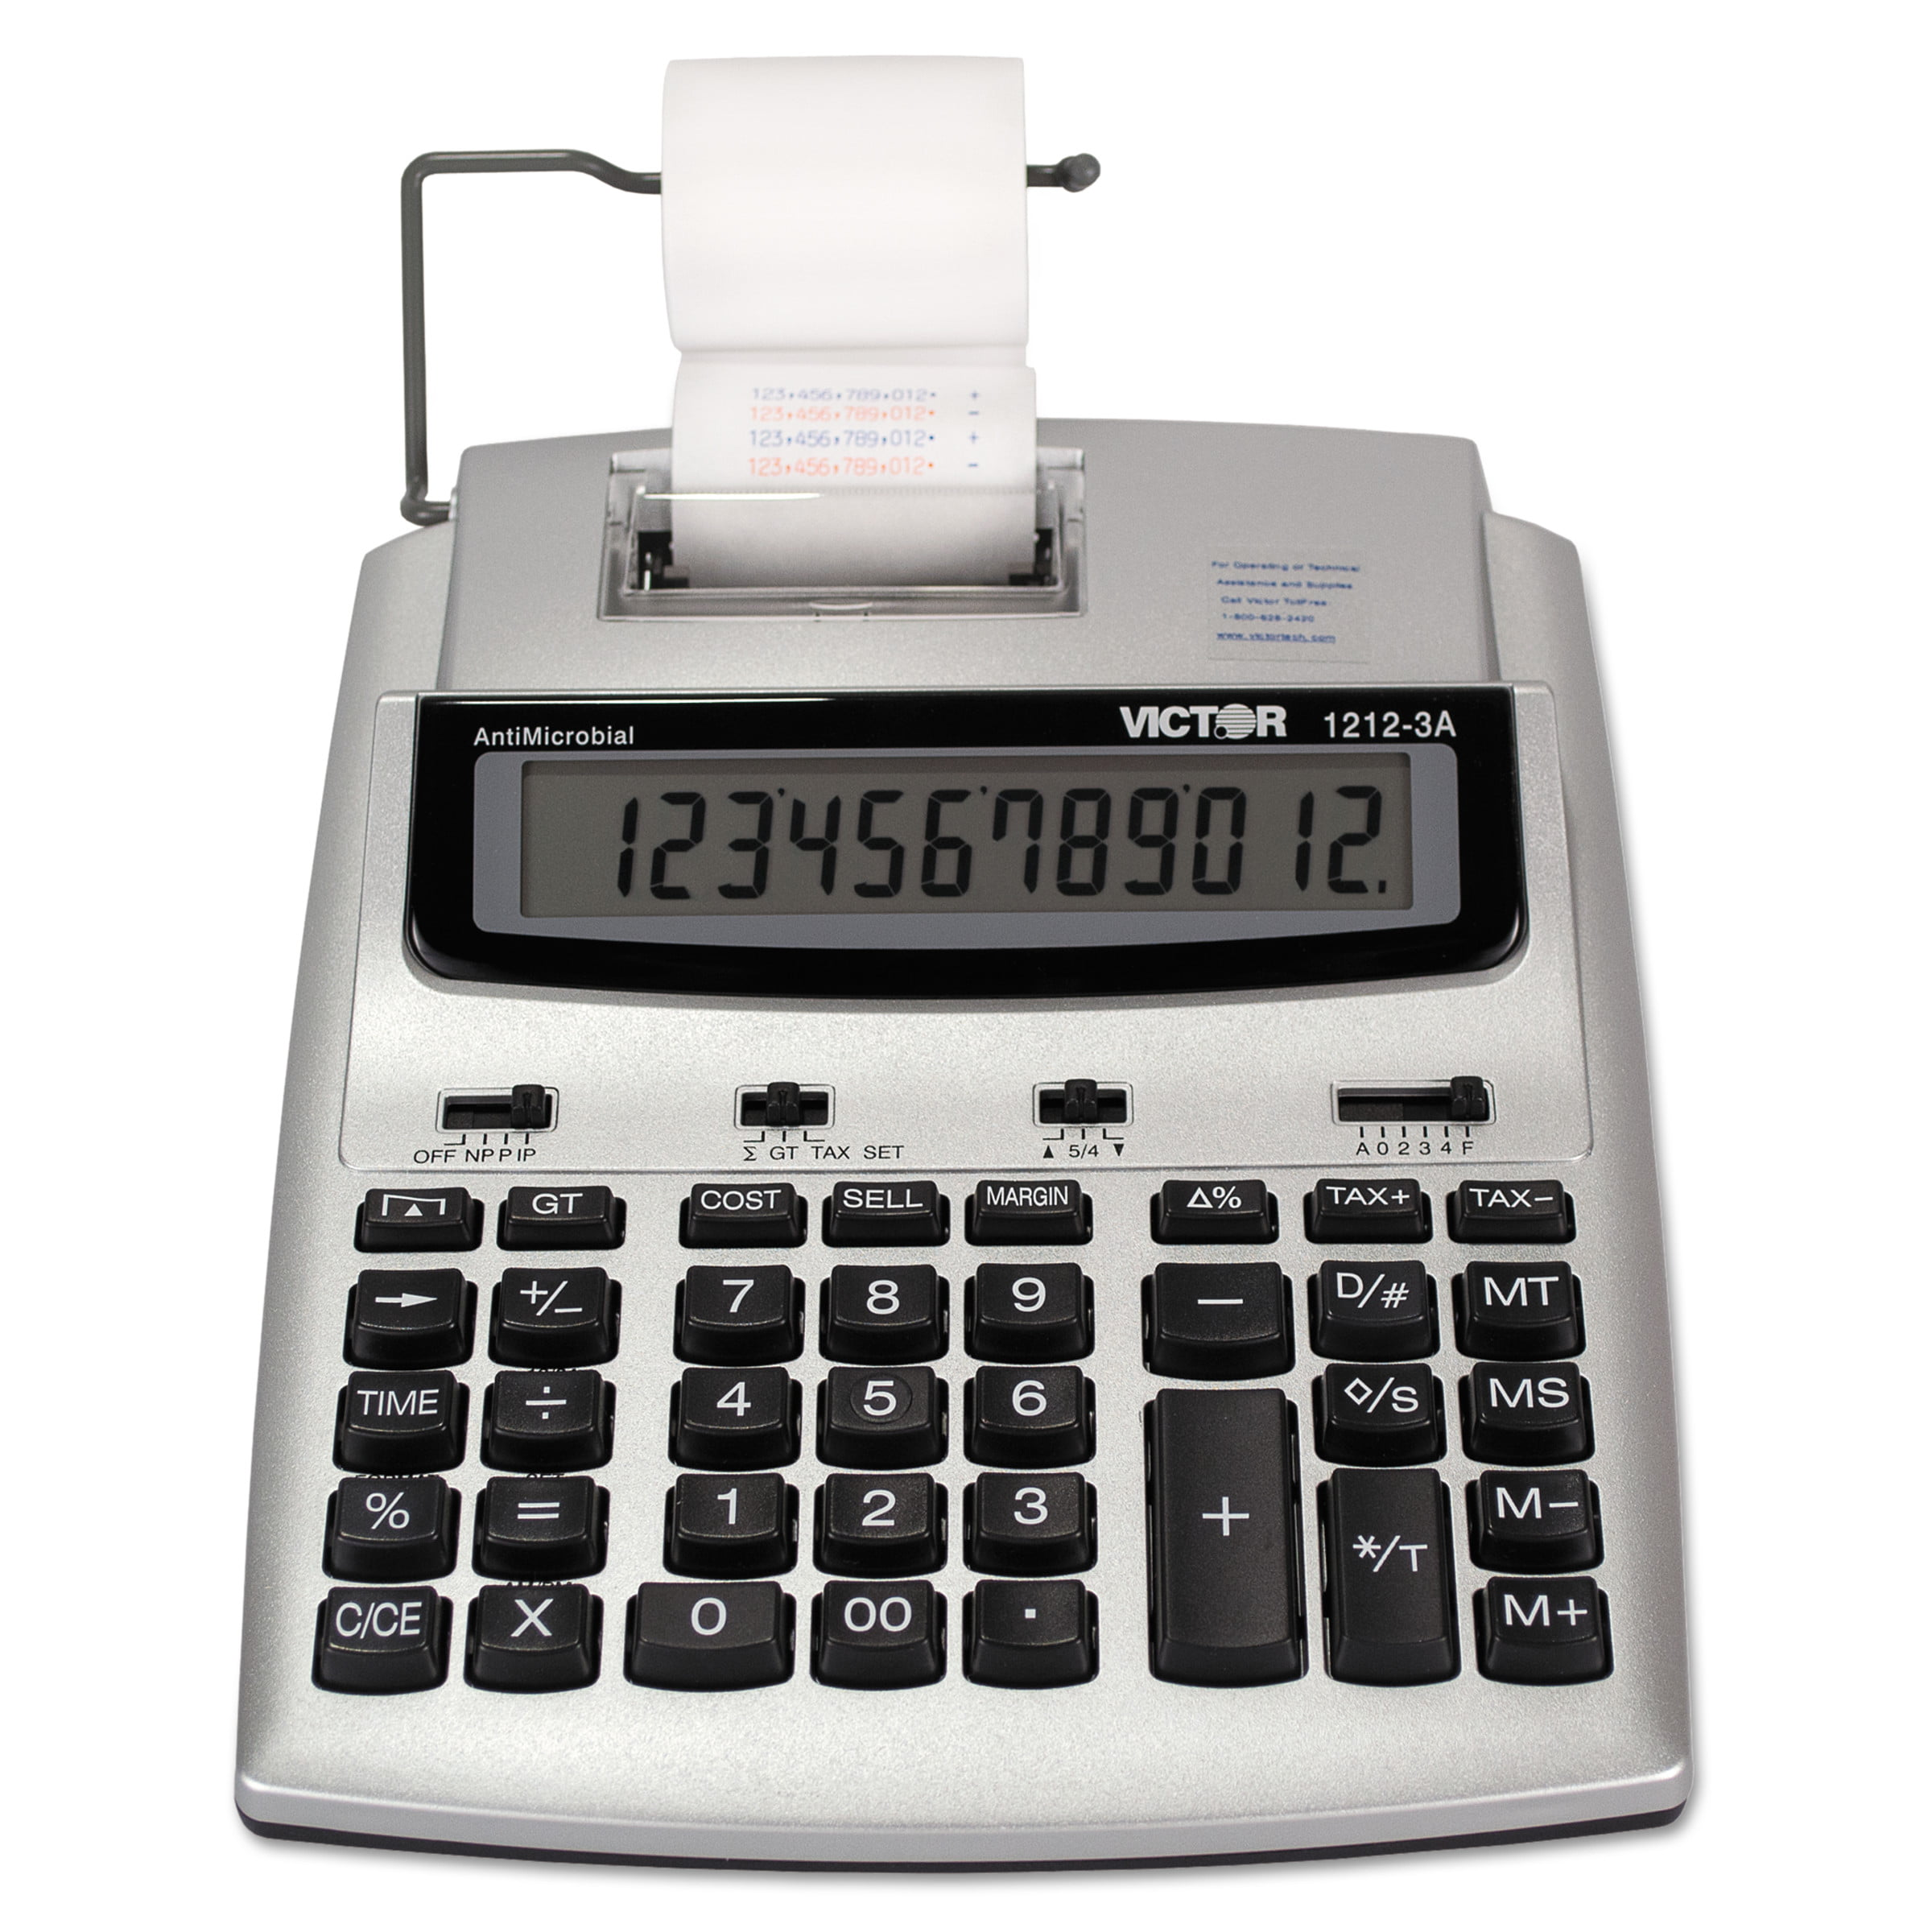 Victor 1212-3A Desktop Printing Calculator